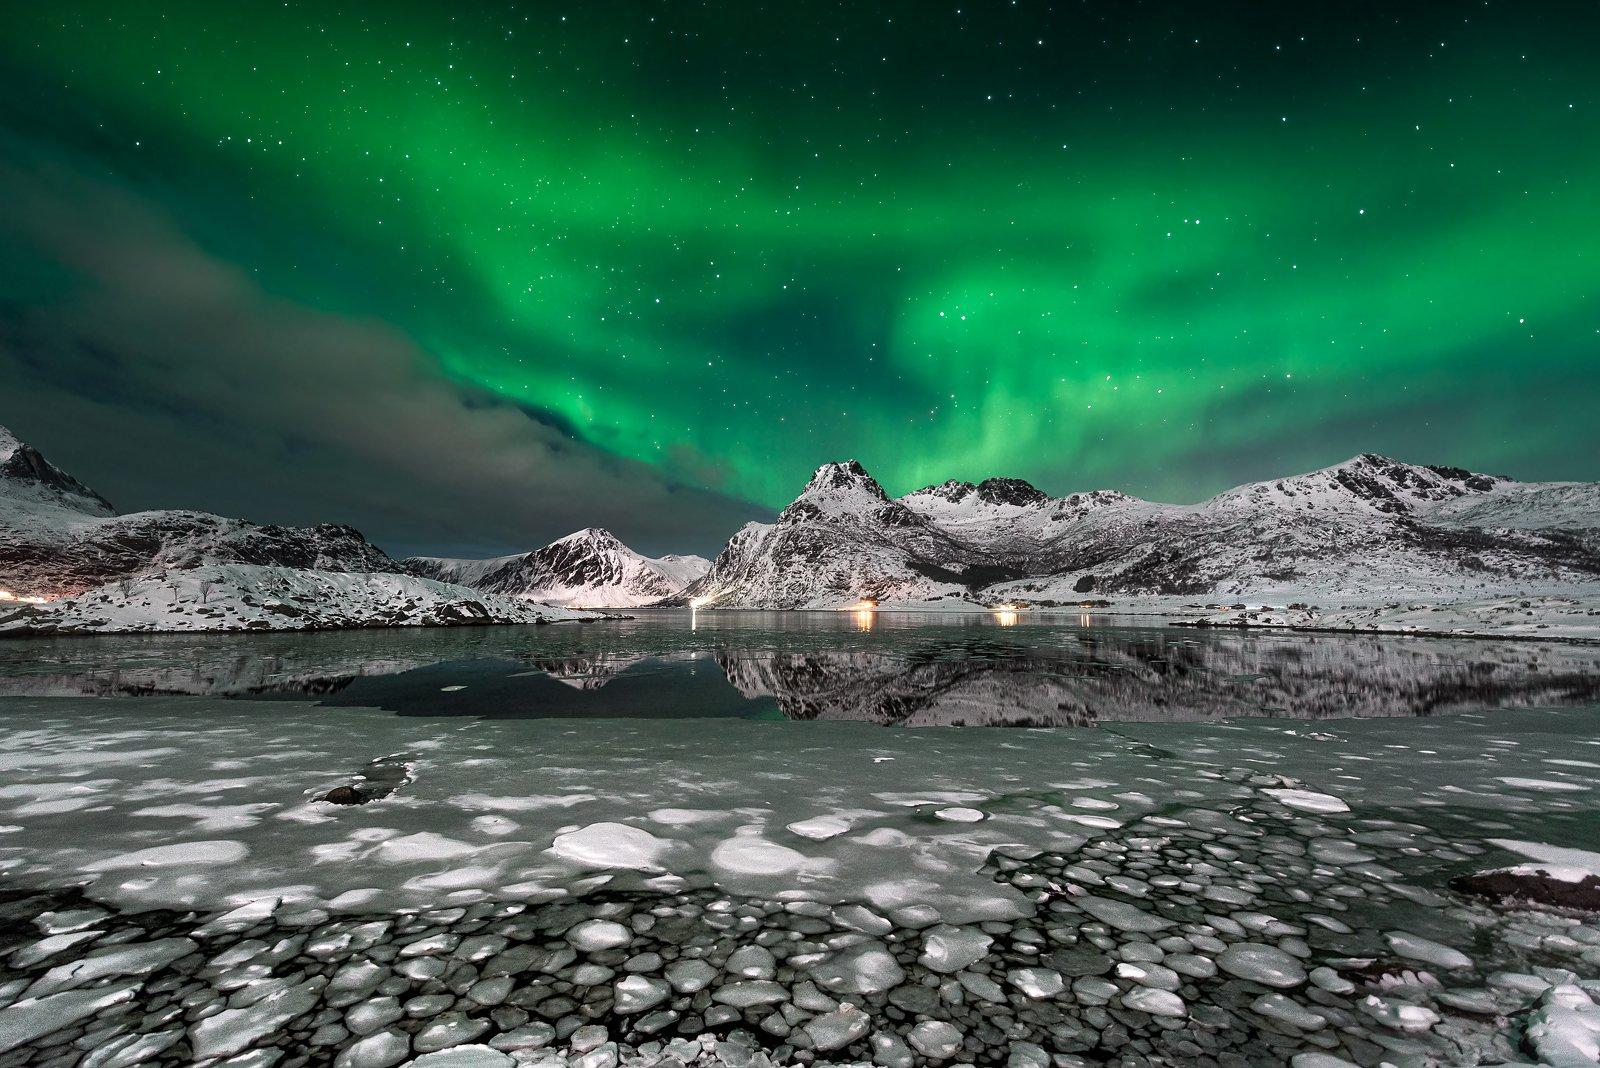 night, star, mysty, lofoten, light, seascape, mountains, ice,  frozen, aurora borealis, Bartłomiej Kończak